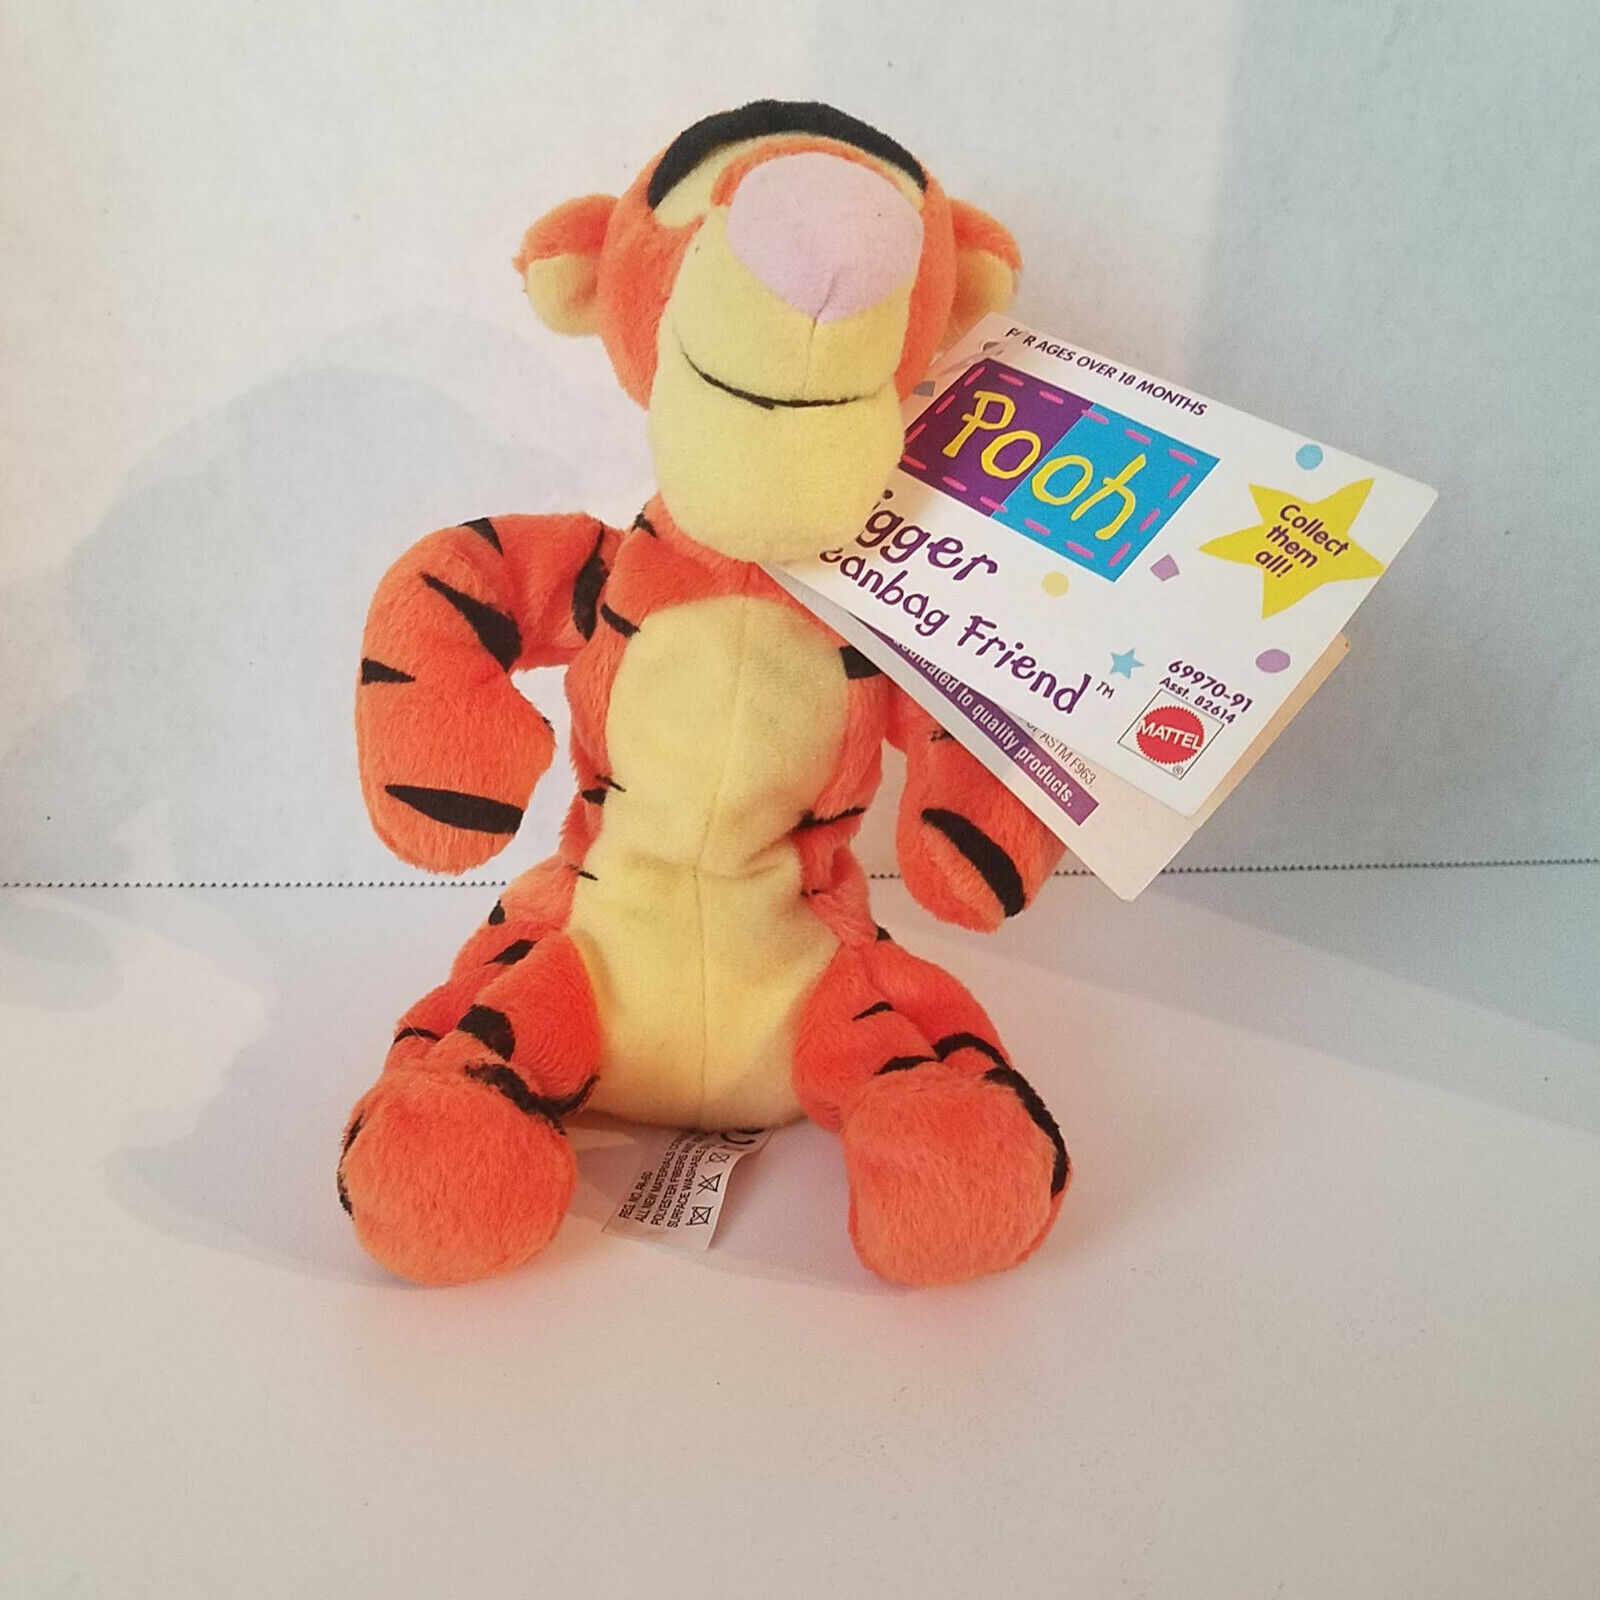 "Disney Authentic Winnie the Pooh Tigger Plush Bean Bag Toy 9/"" Stuffed Animal"